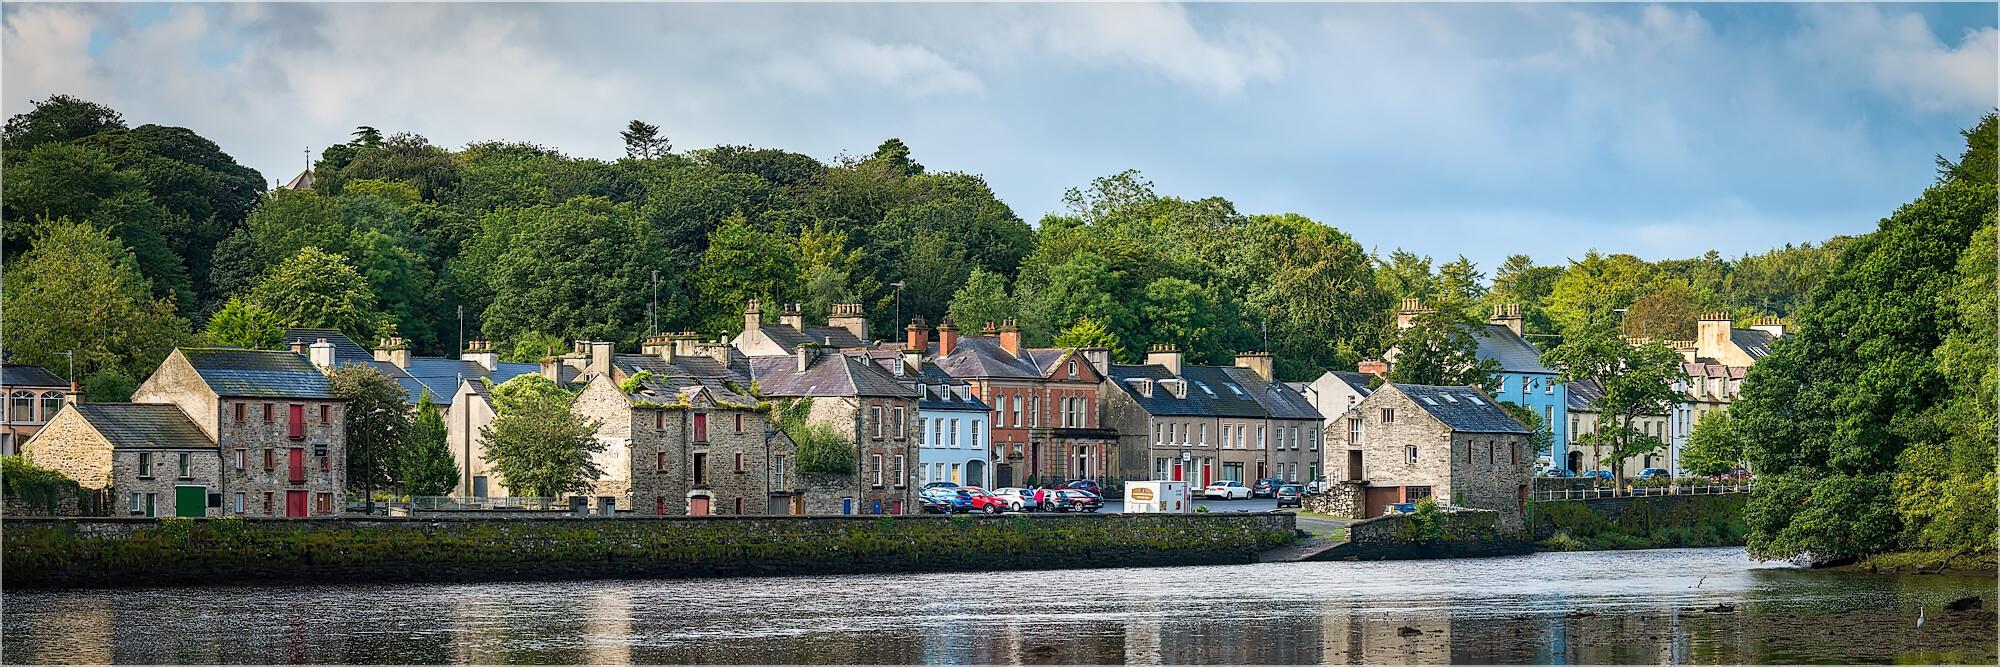 Panoramabild Häuserzeile in Irland